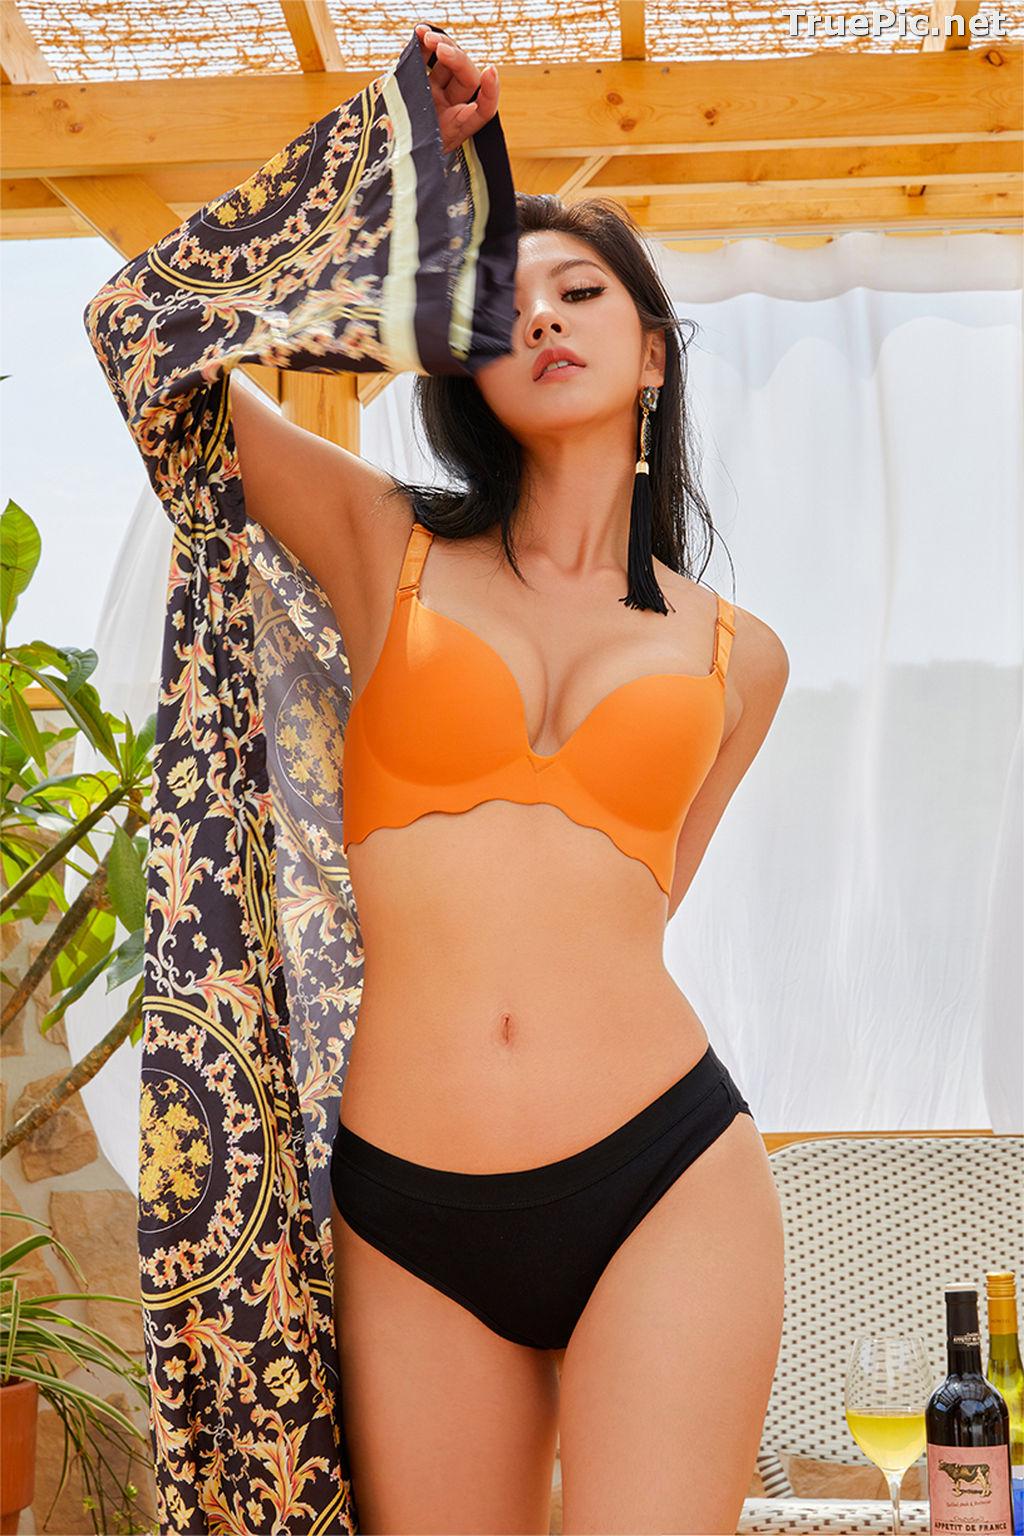 Image Korean Fashion Model – Lee Chae Eun (이채은) – Come On Vincent Lingerie #6 - TruePic.net - Picture-7